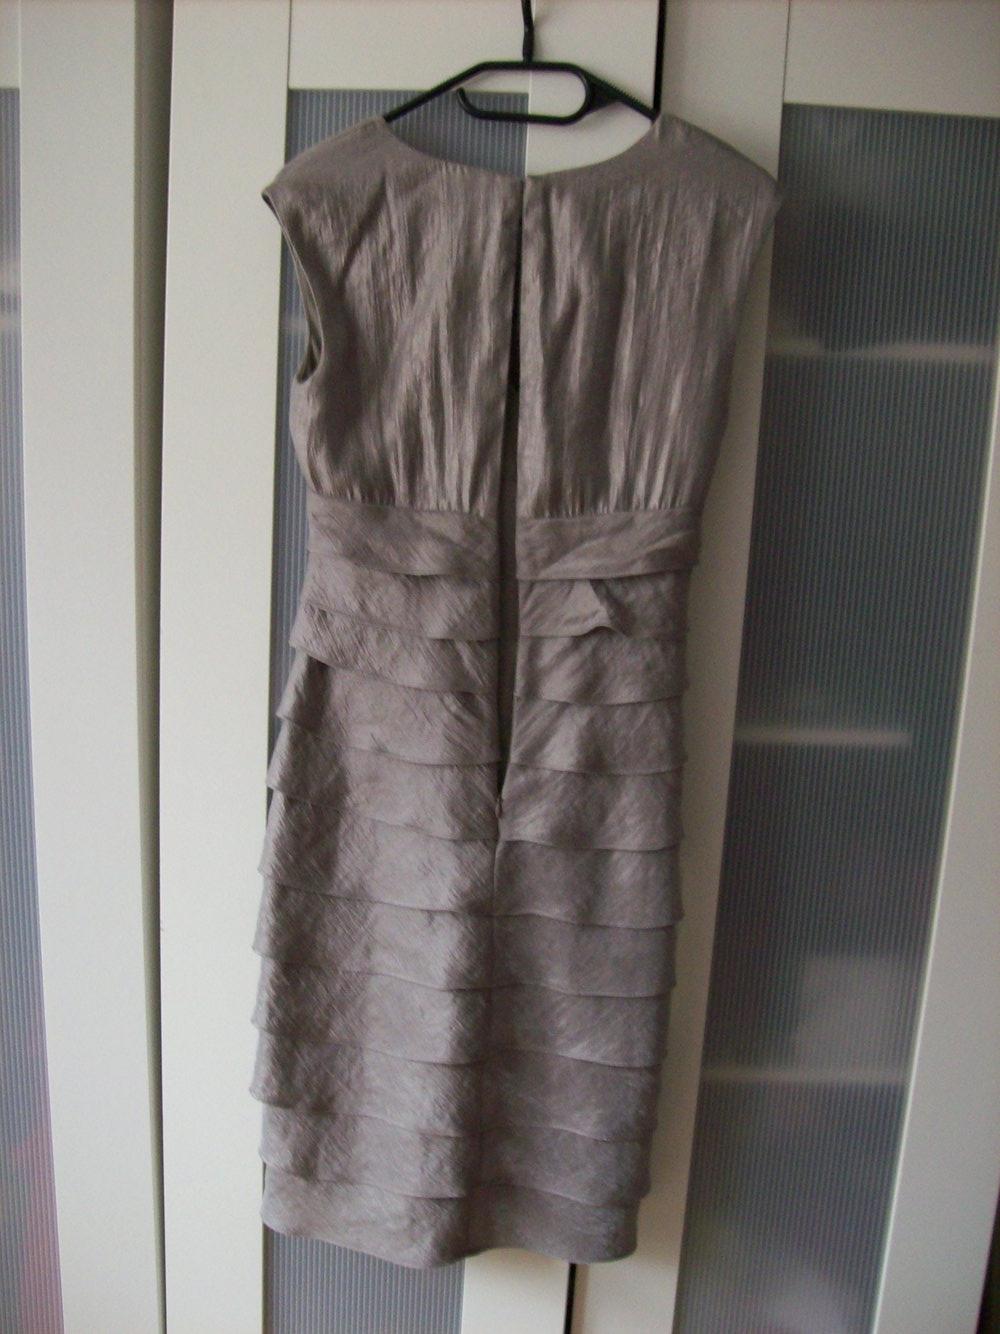 6e6cdc8298b5ec mariposa - beiges Kleid :: Kleiderkorb.ch